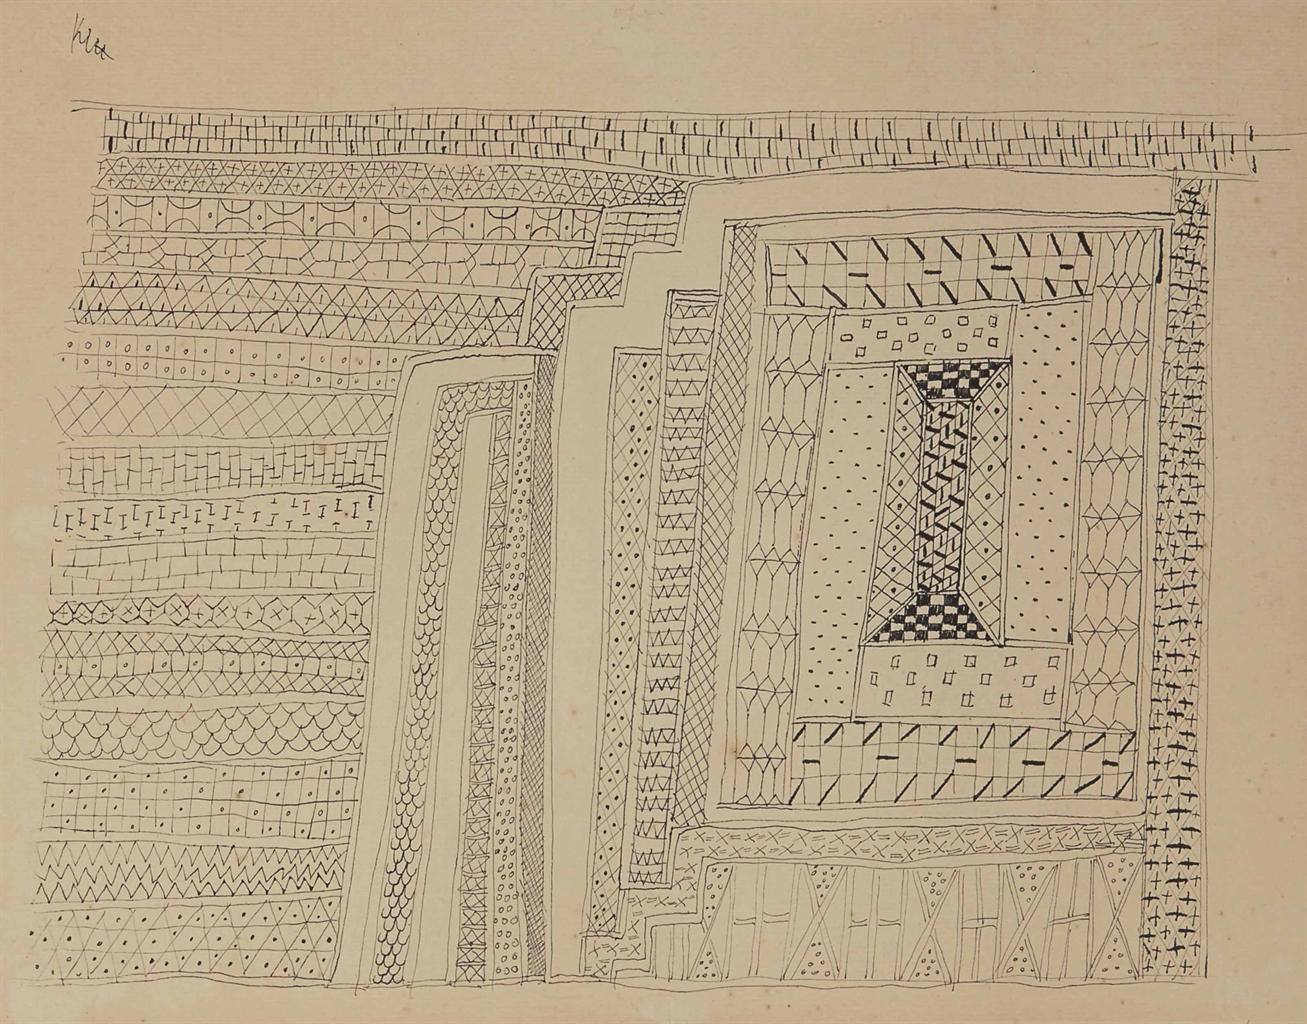 Paul Klee-Teppich-1927